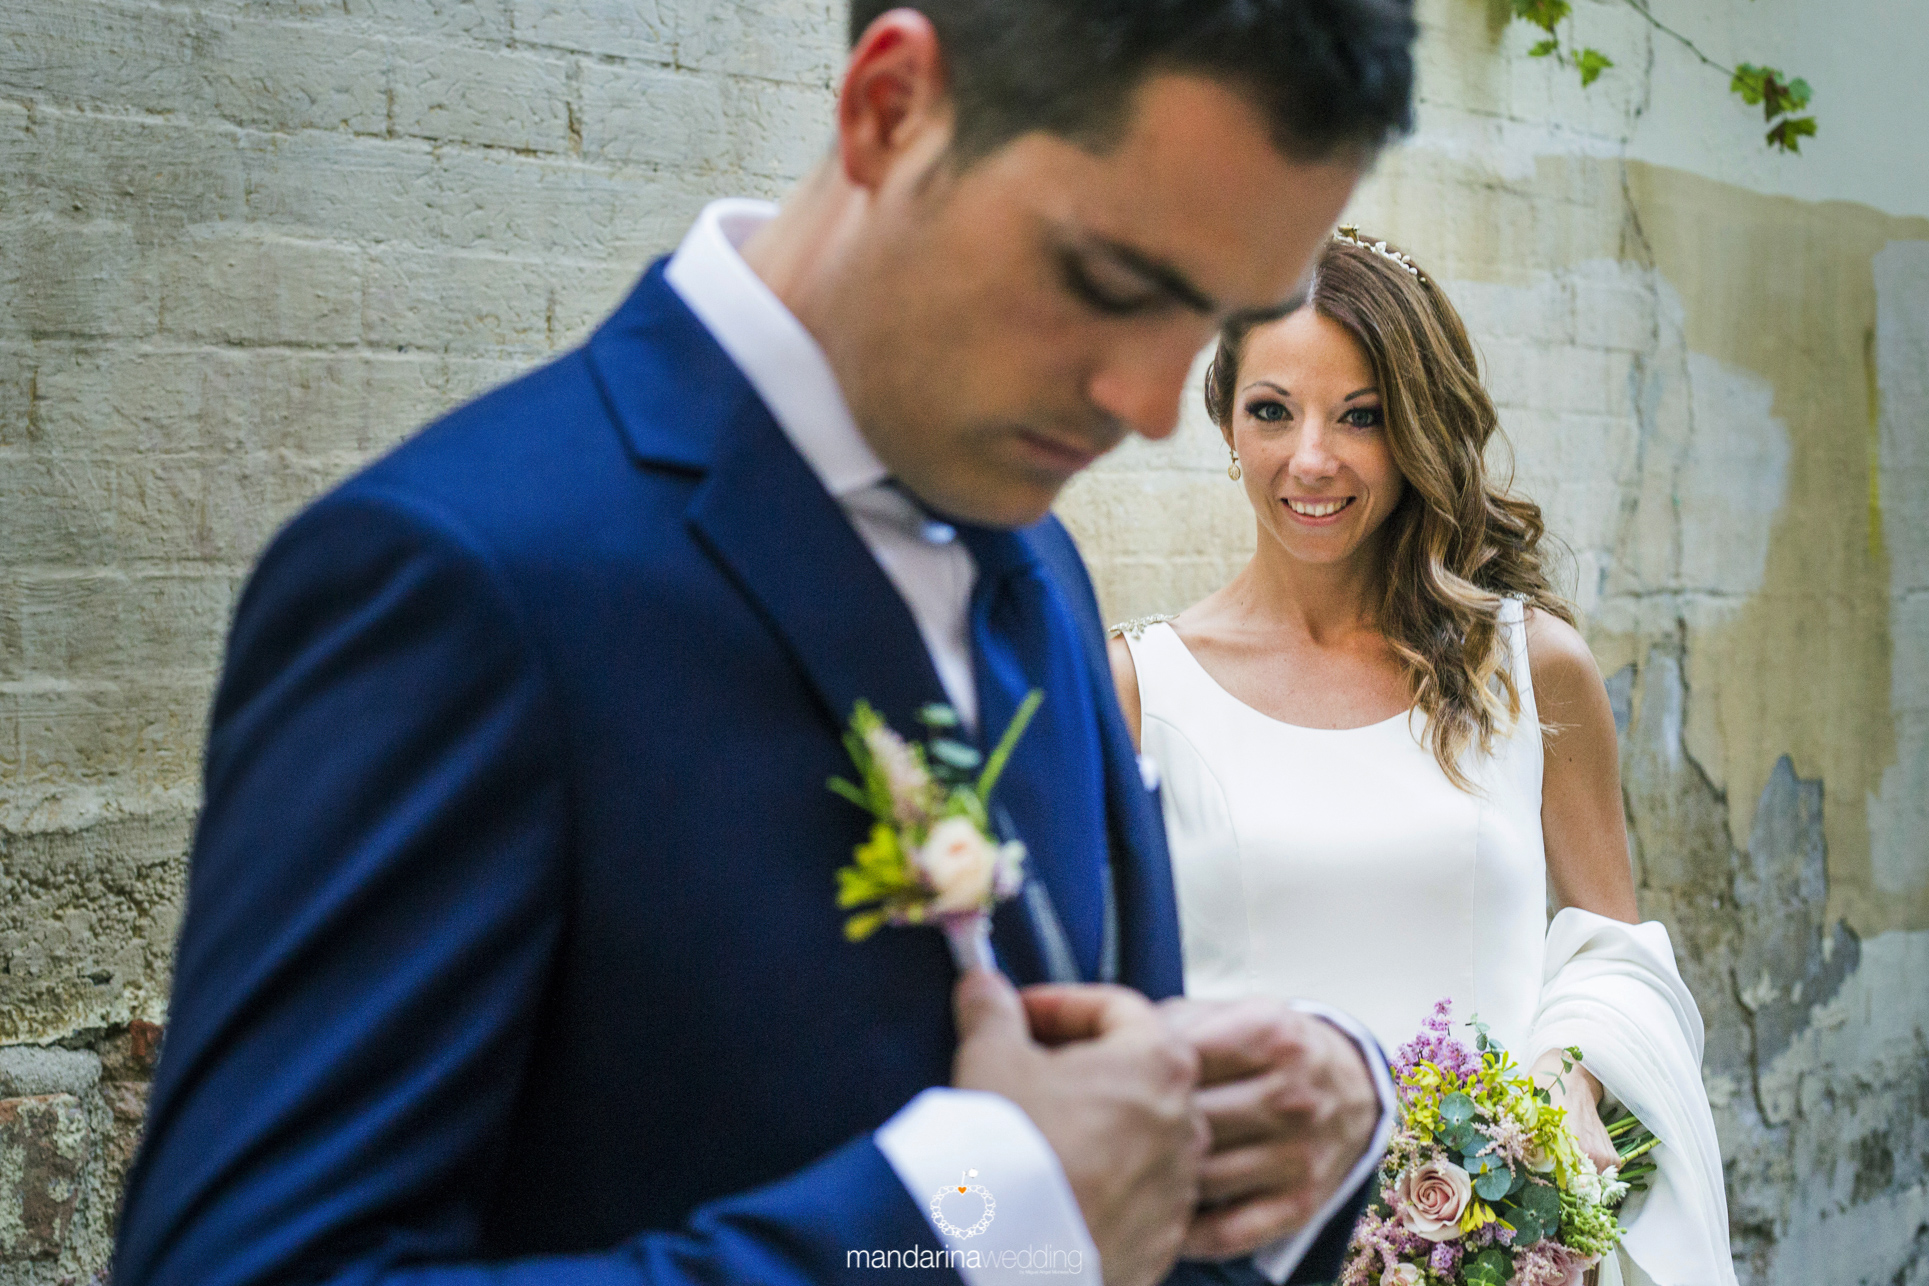 mandarina wedding, fotografo boda pais vasco, fotografo boda zaragoza, fotógrafo boda soria, fotografo boda Madrid, fotógrafo boda tarragona-27